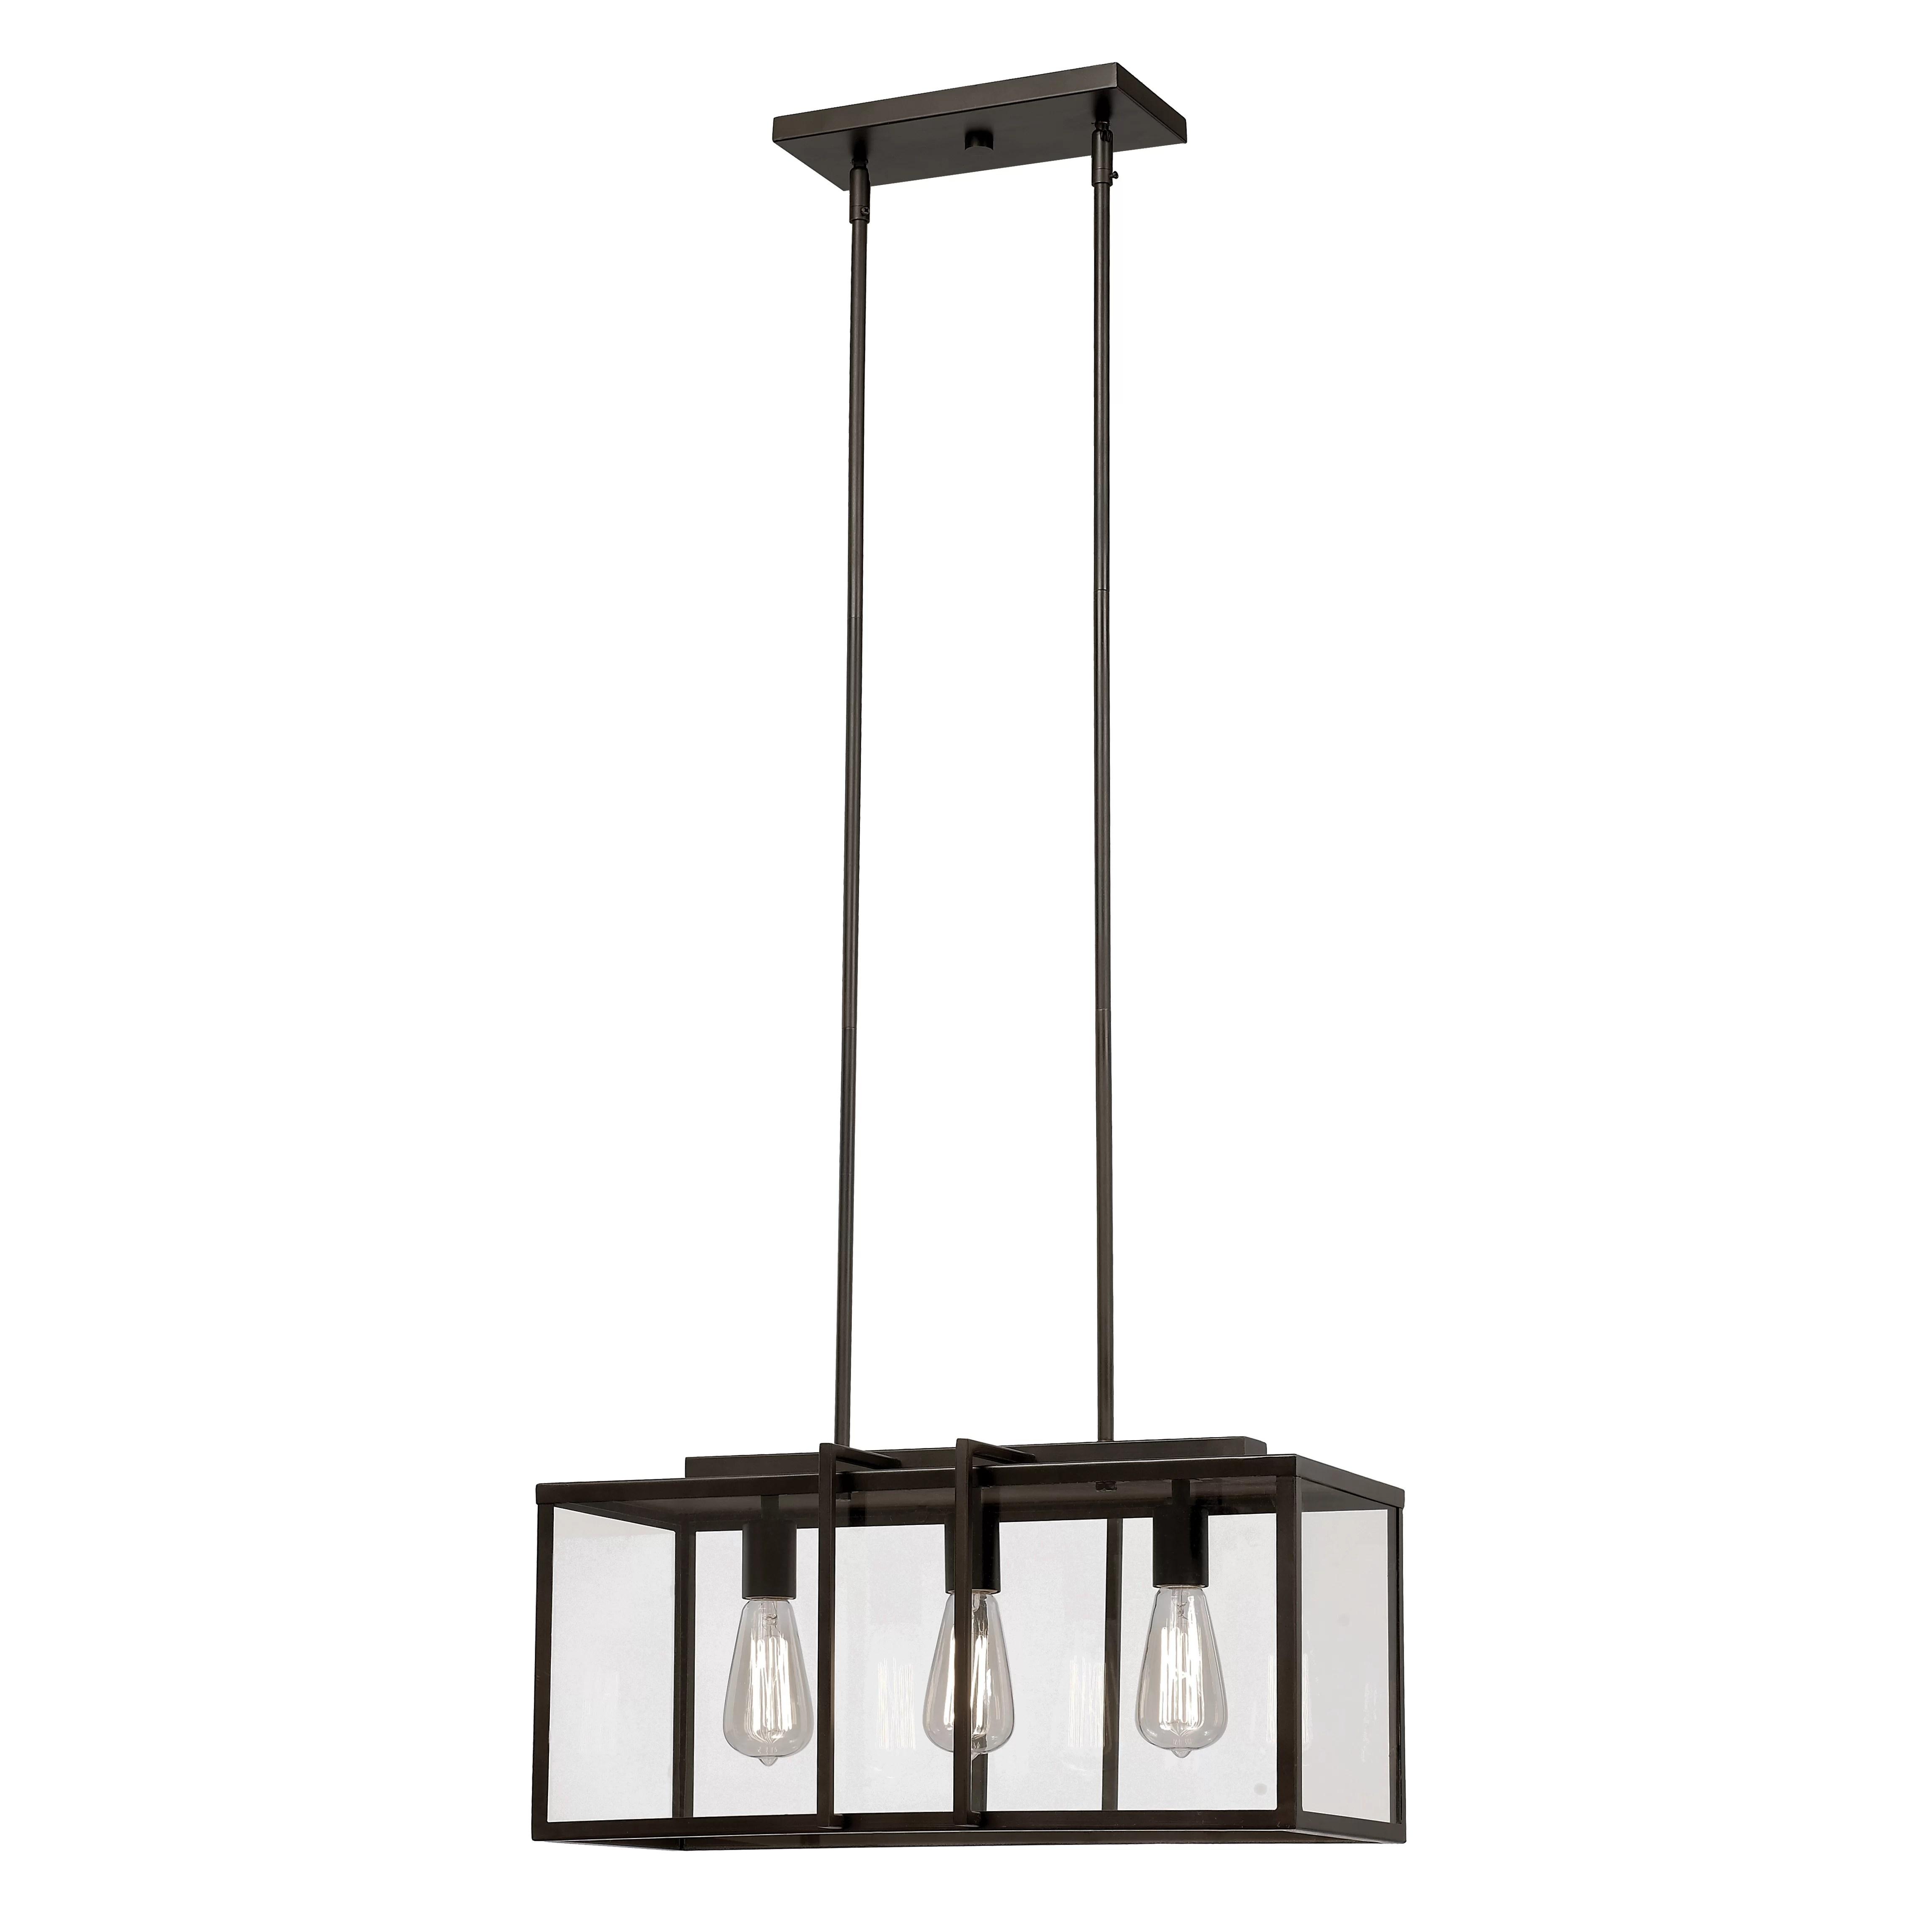 3 light kitchen island pendant chairs wood trent austin design